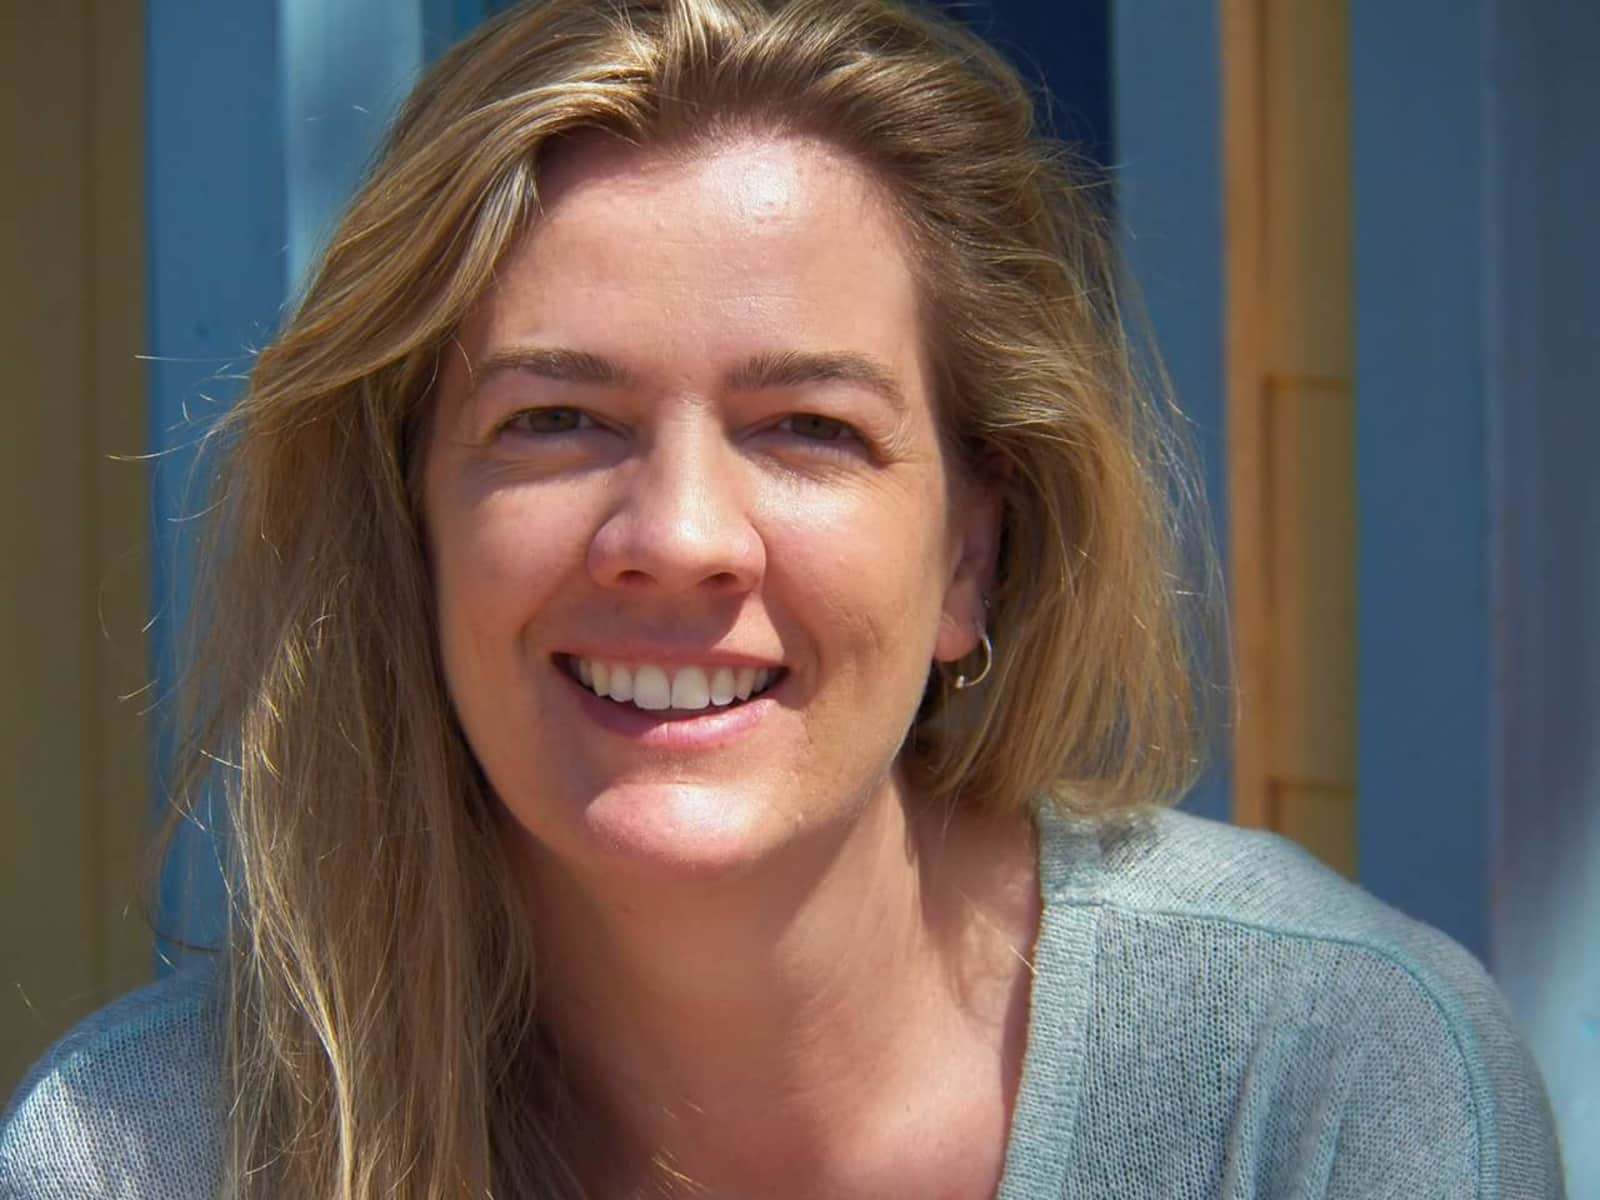 Julie from Upper Love, U.S. Virgin Islands